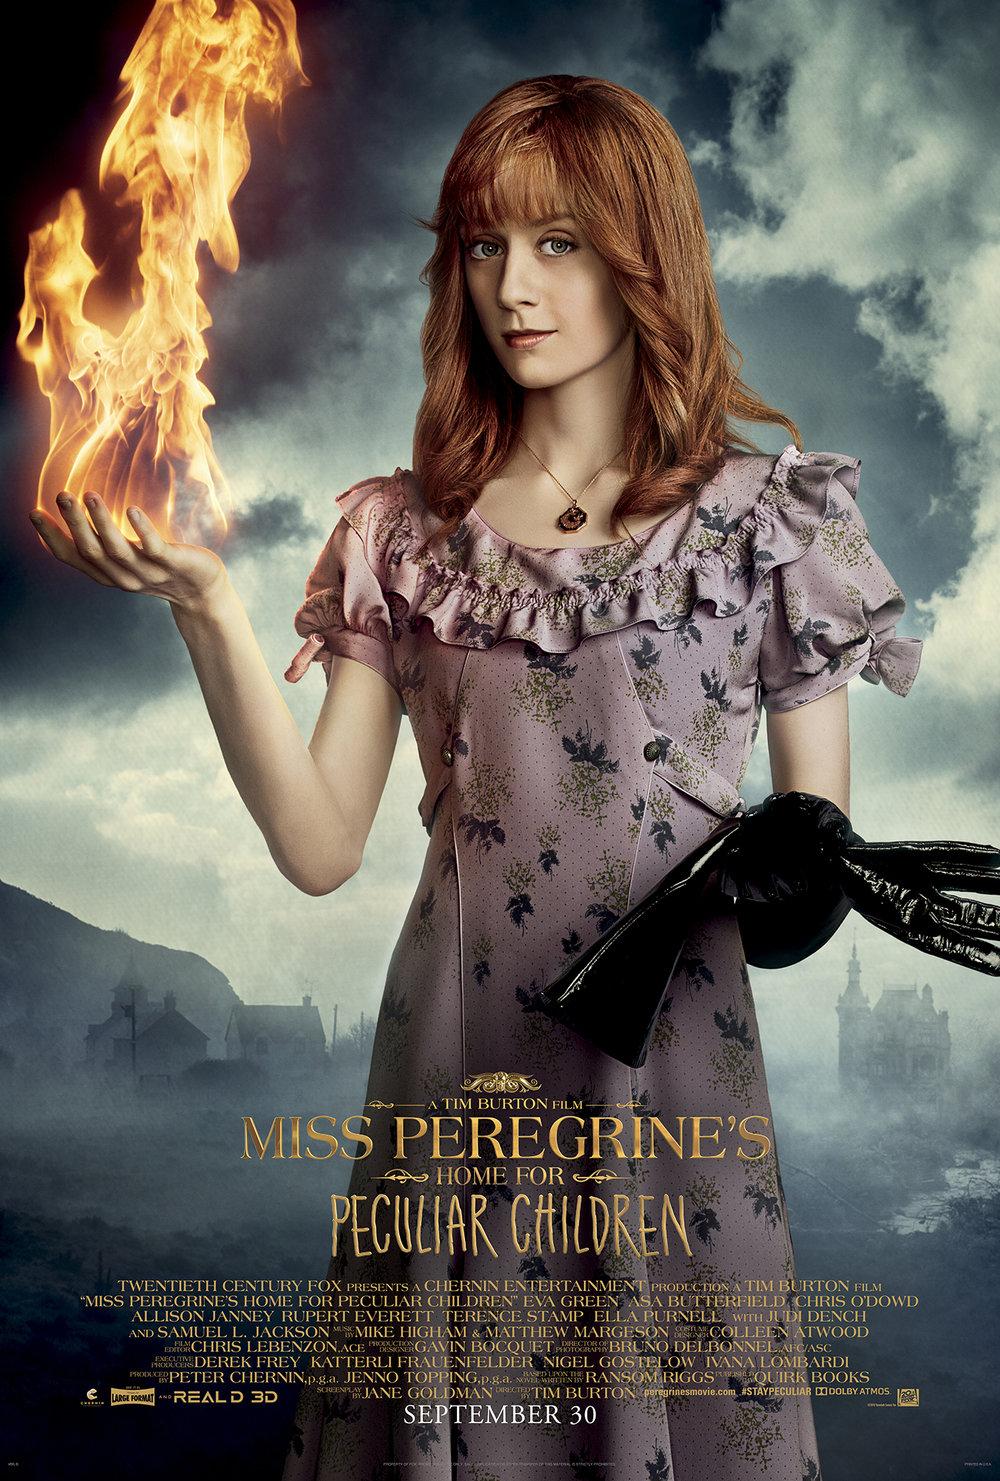 MissPeregrines_1Sht_FireGirl_100dpi.jpg